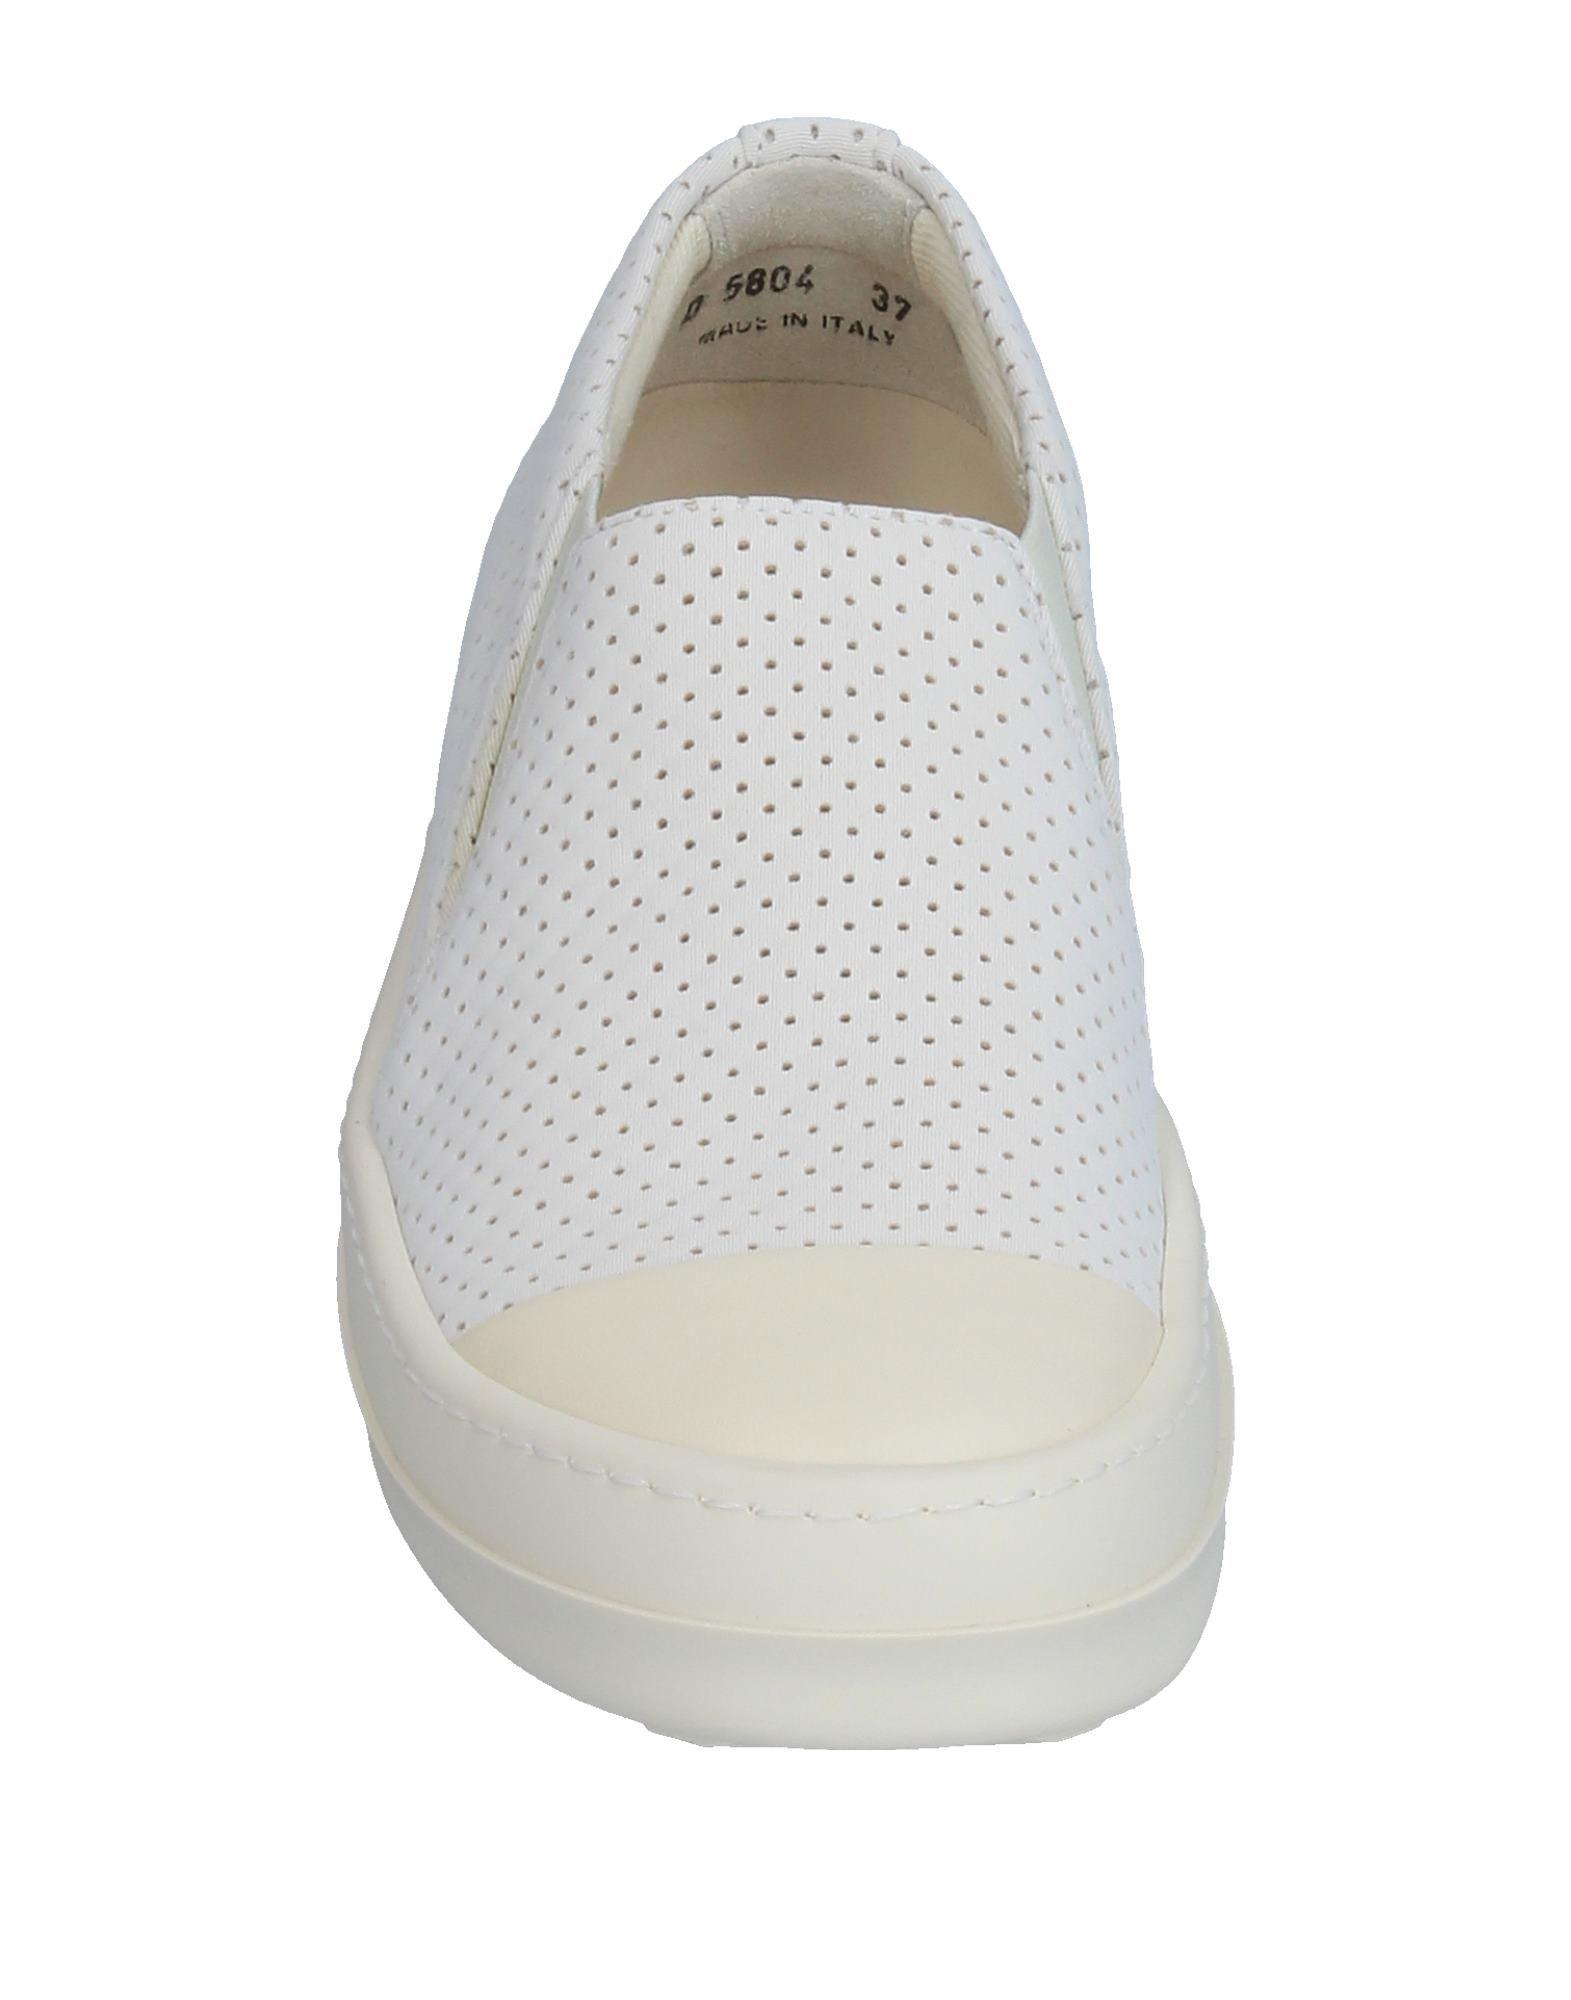 Rabatt Owens Schuhe Drkshdw By Rick Owens Rabatt Sneakers Damen  11358651LK 83c7d4